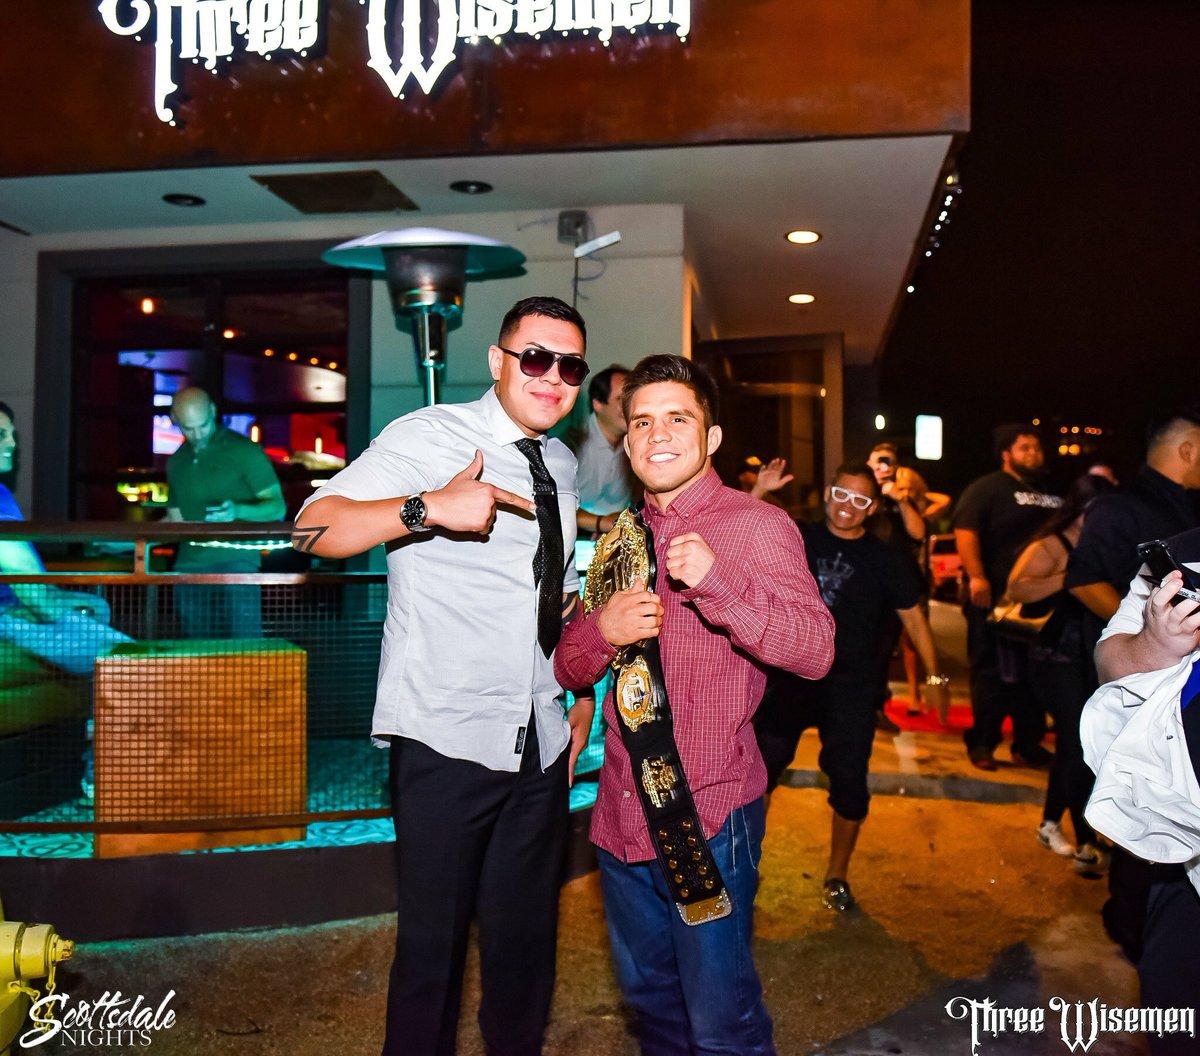 #HenryCejudo Victory Party @ 9pm ~ Three Wisemen ... w/ DJ Filthy Flip ~ DJ Up All Nite ~ DJ Pyscopat ... Many Special Guests in Attendance 👀 Gem Ray at 480.772.7613 (Text) ... http://www.threewisemenaz.com  @HenryCejudo @GemRayMedia @ScottsdaleNites